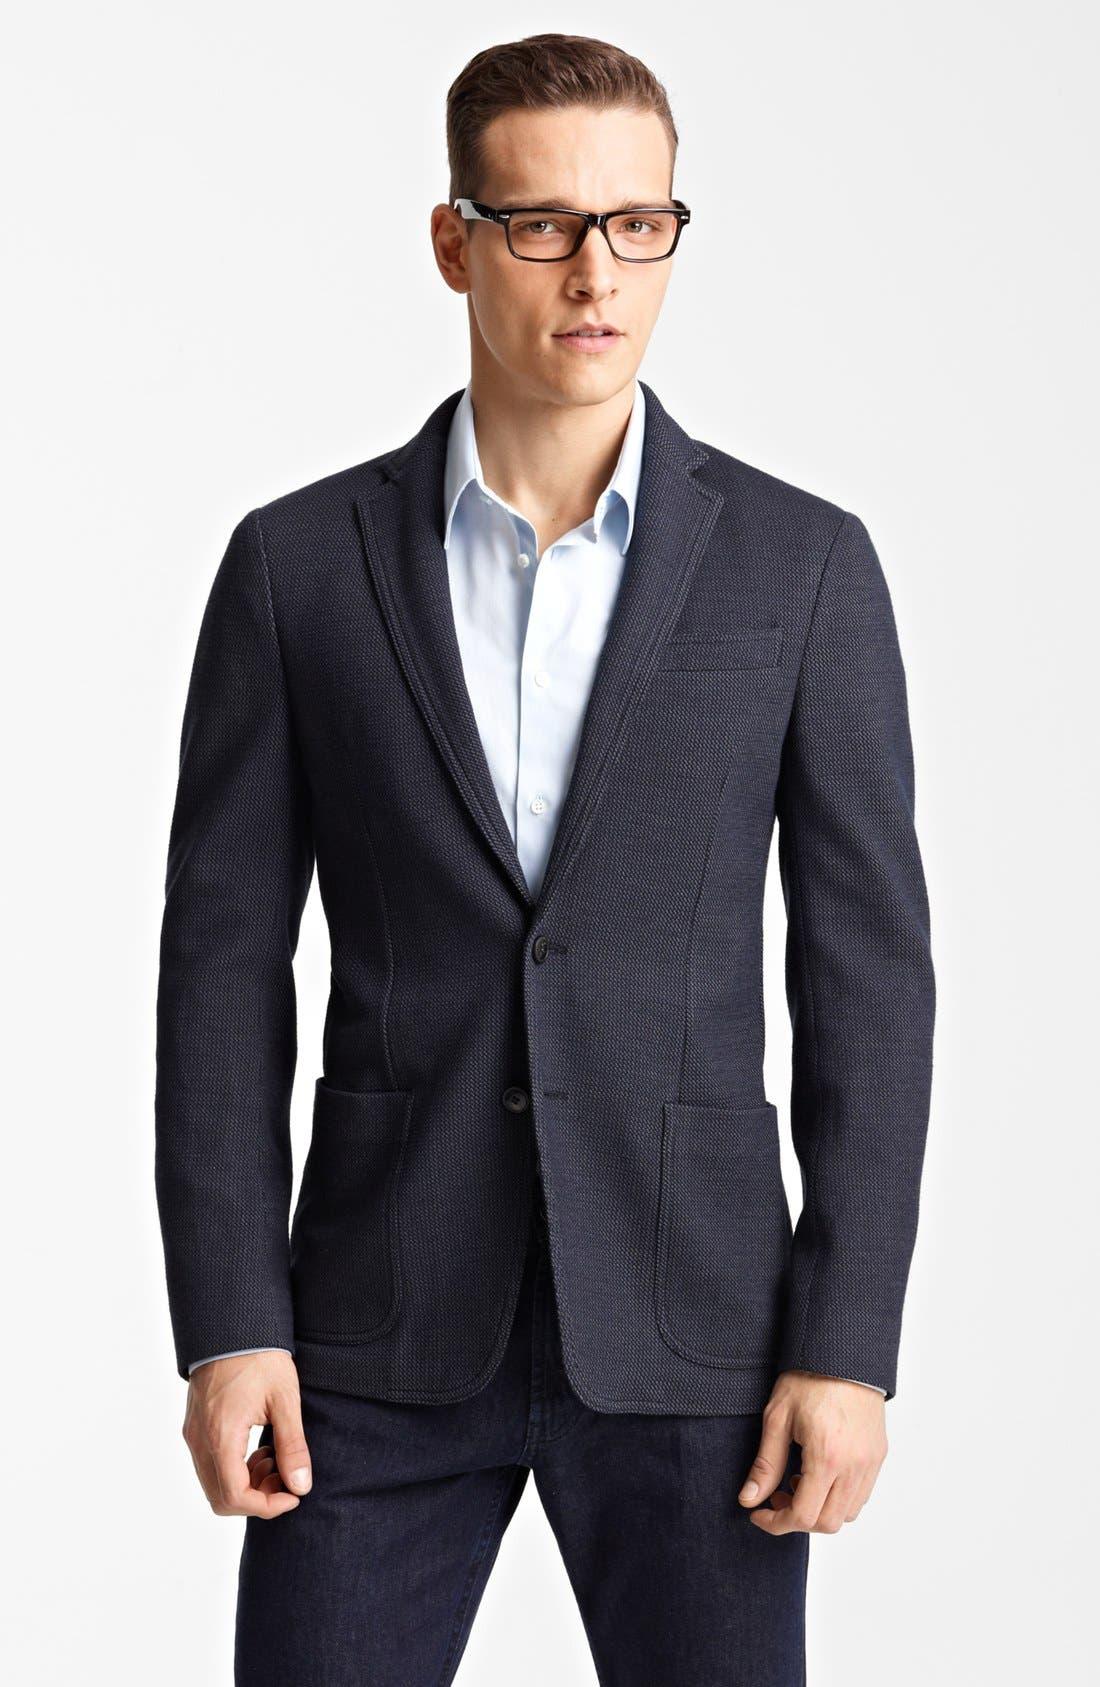 Alternate Image 1 Selected - Armani Collezioni 'Linea' Tic Weave Sportcoat